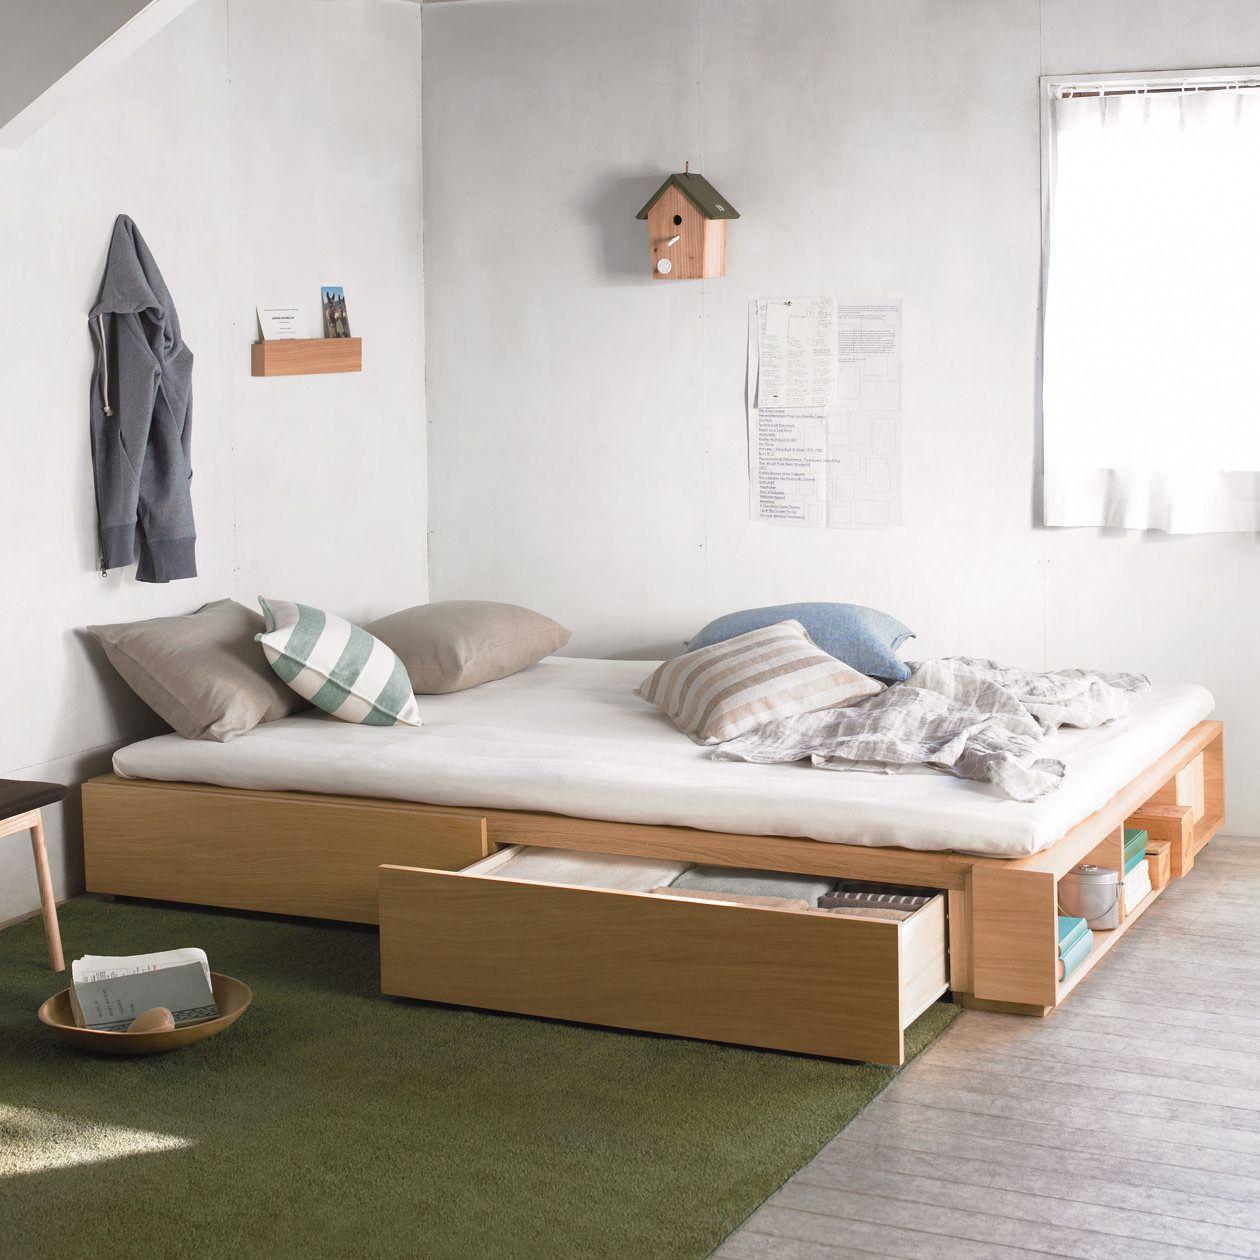 Muji Online Welcome To The Muji Online Store Minimalist Room Minimalist Bedroom Stylish Bedroom Design